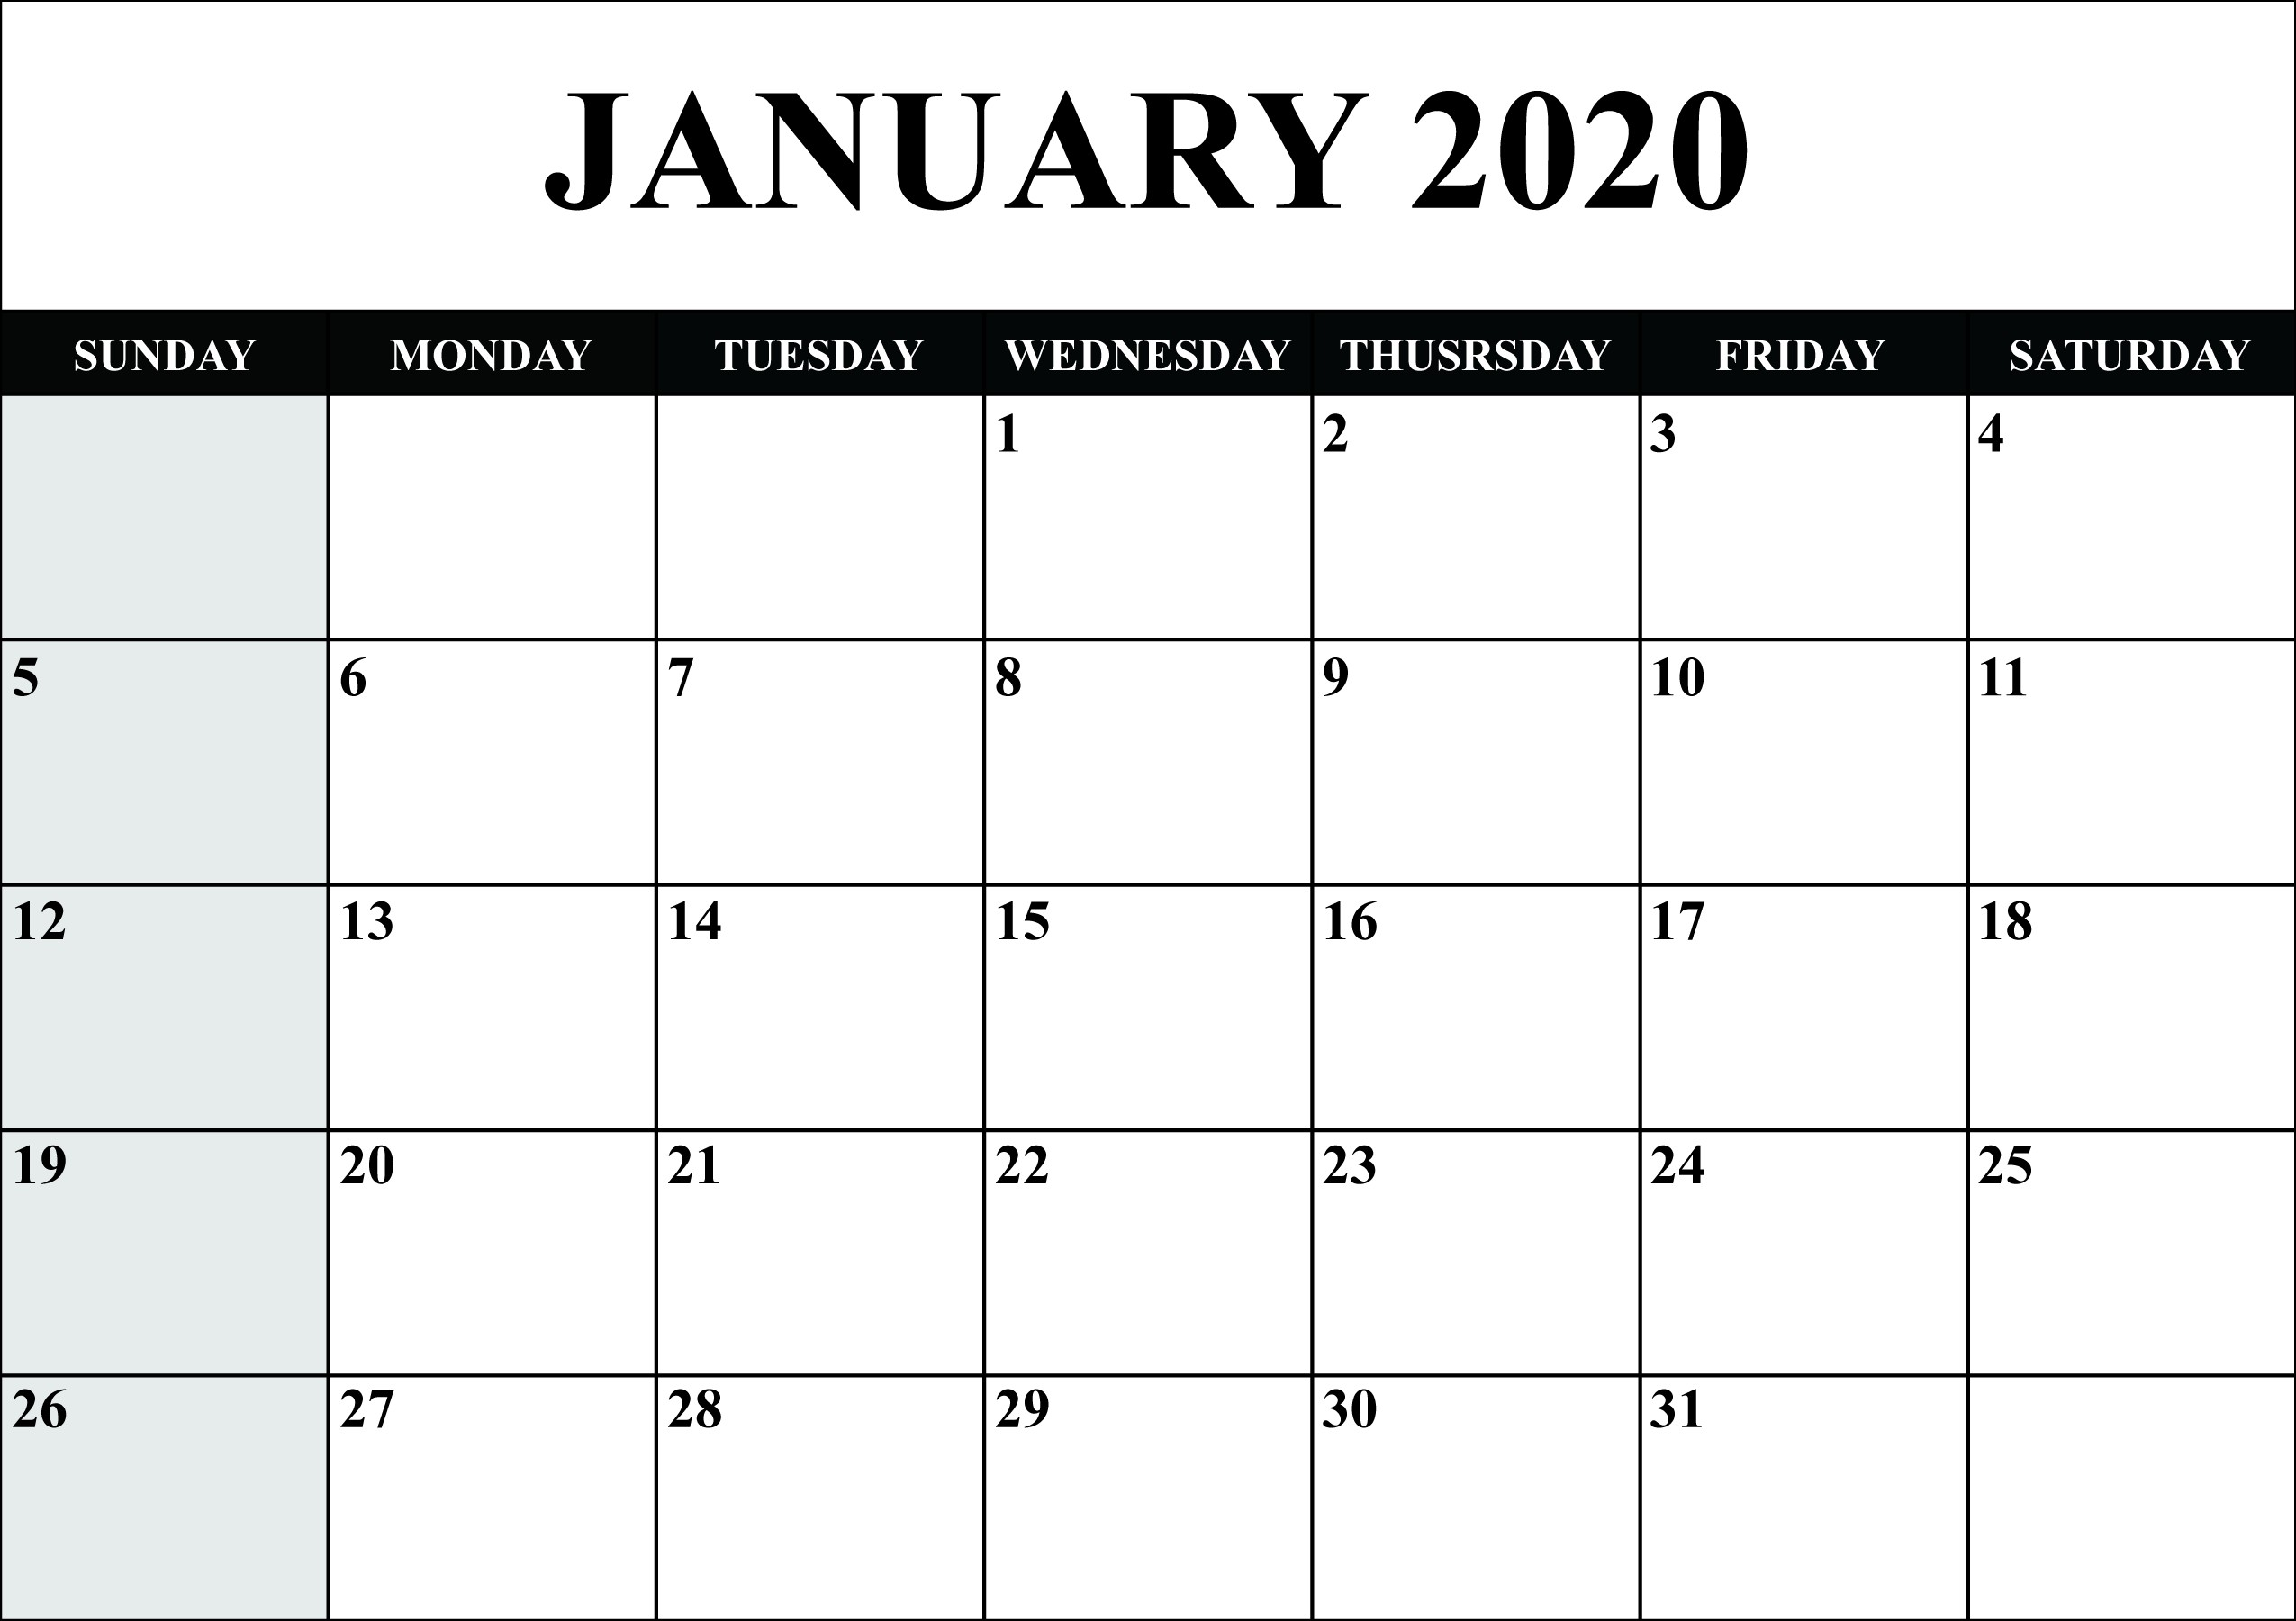 Free Blank January 2020 Calendar Printable in PDF Word